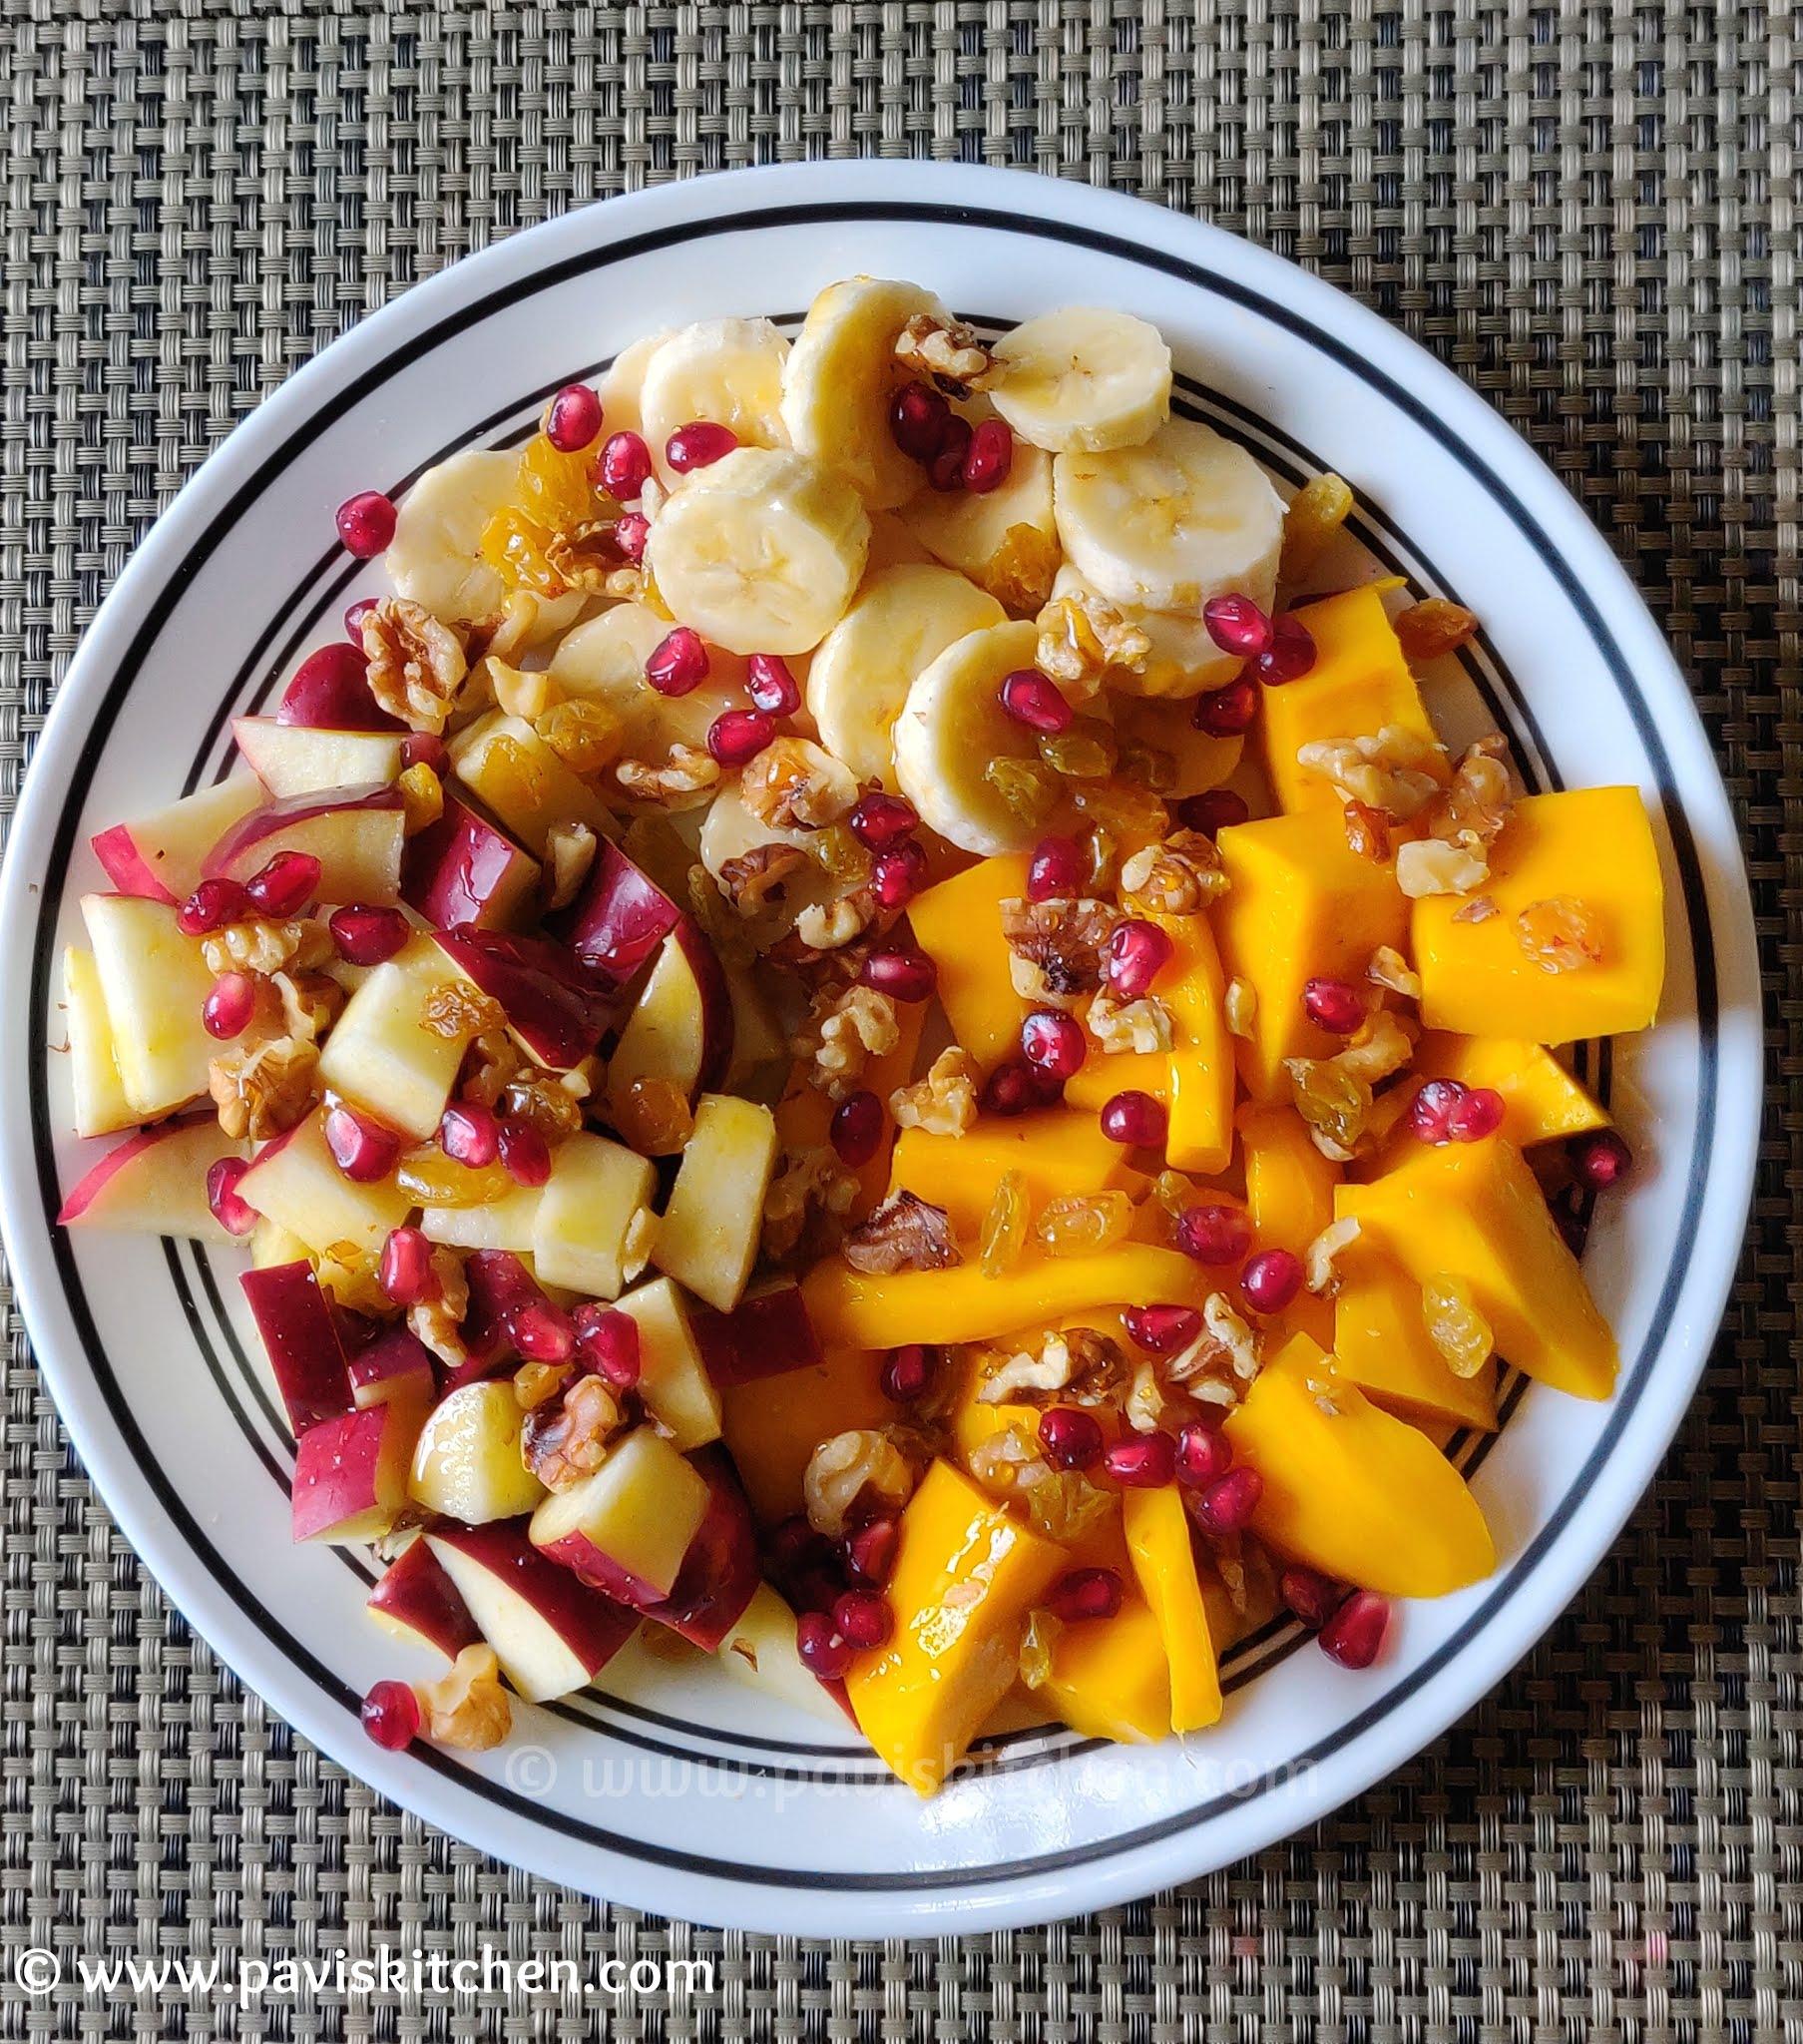 Fruit salad recipe | Indian fruit salad | how to make fruit salad Indian style